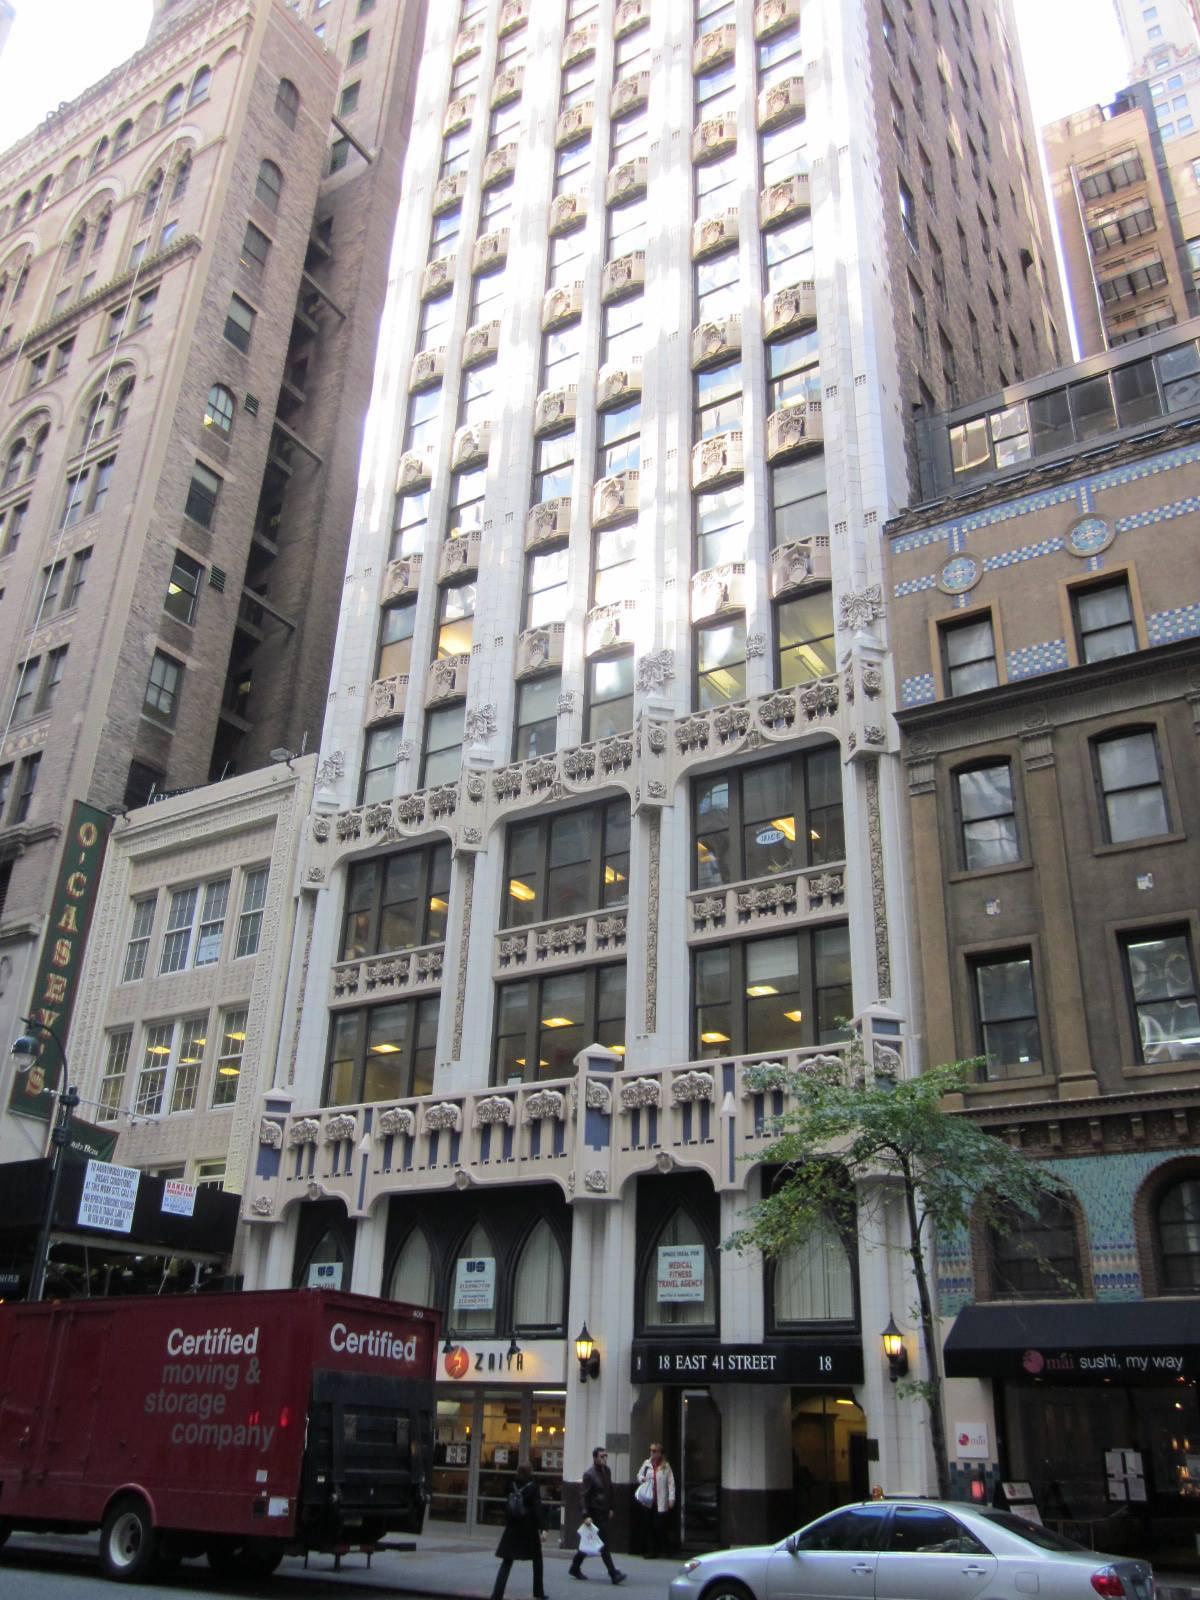 18 East 41st Street. LPC photo